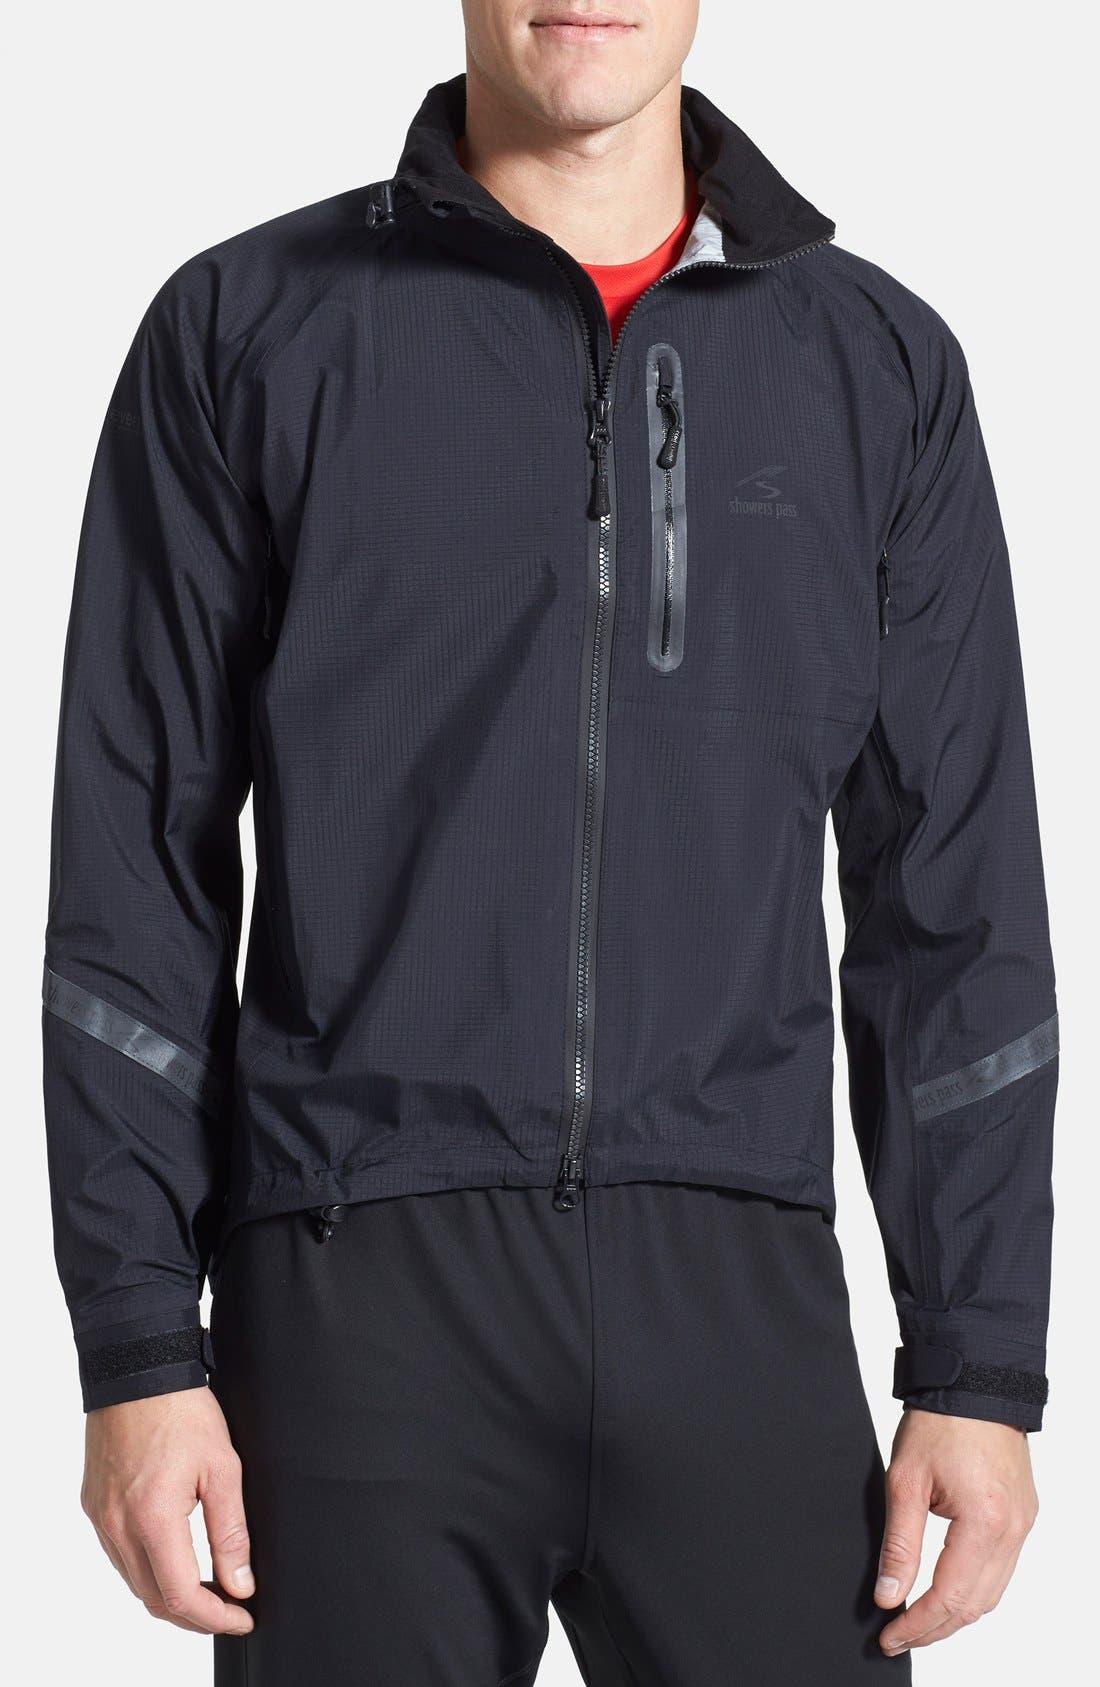 SHOWERS PASS,                             'Elite 2.1' Trim Fit Waterproof Hooded Jacket,                             Main thumbnail 1, color,                             001